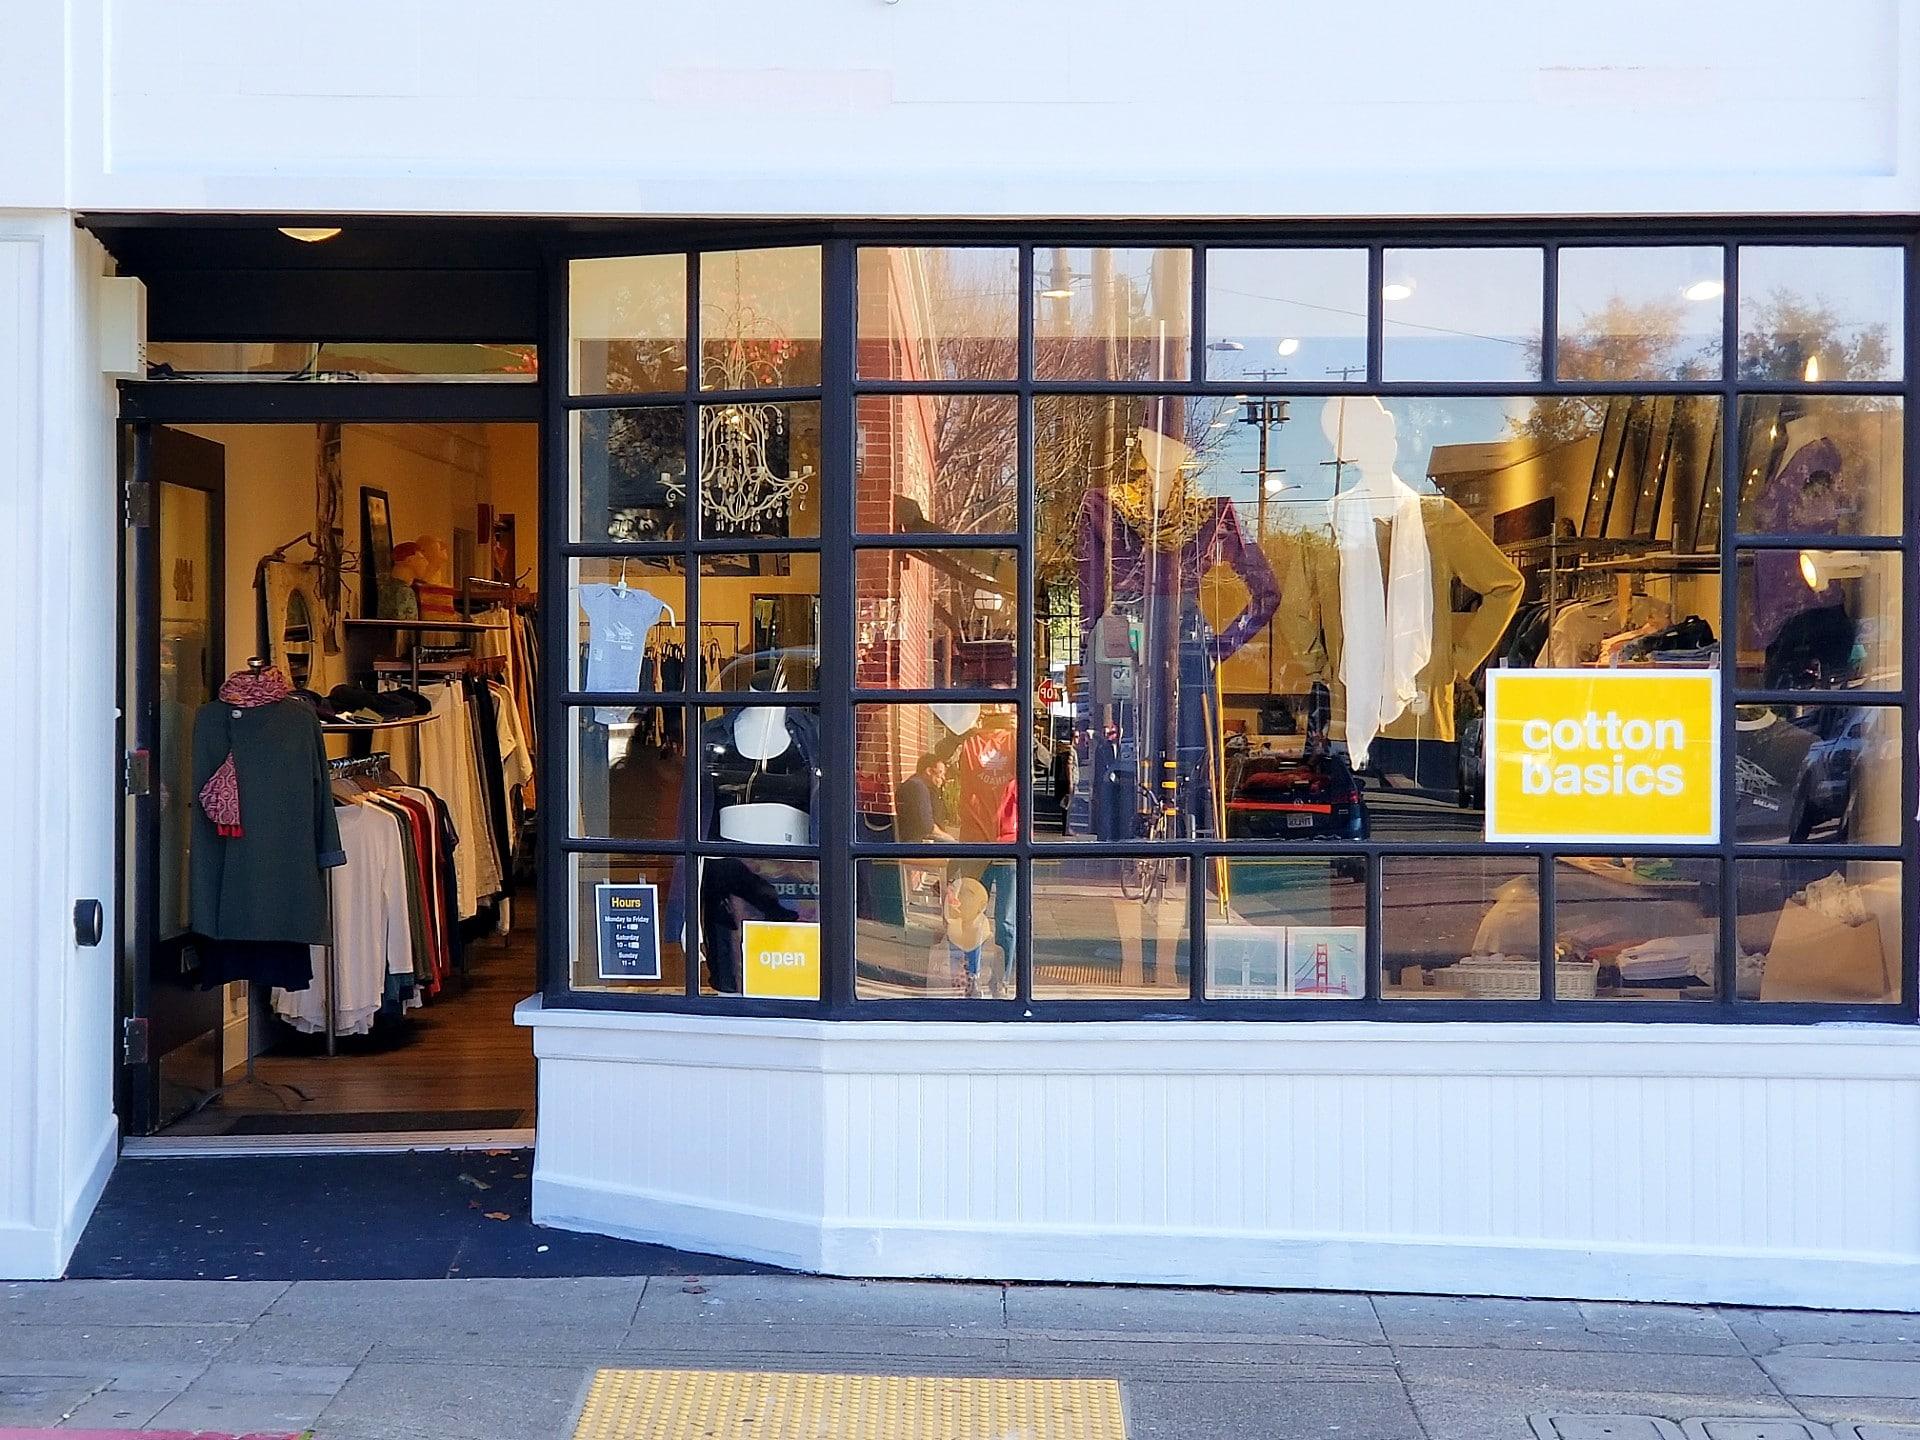 Cotton Basics on Piedmont Ave Oakland, CA